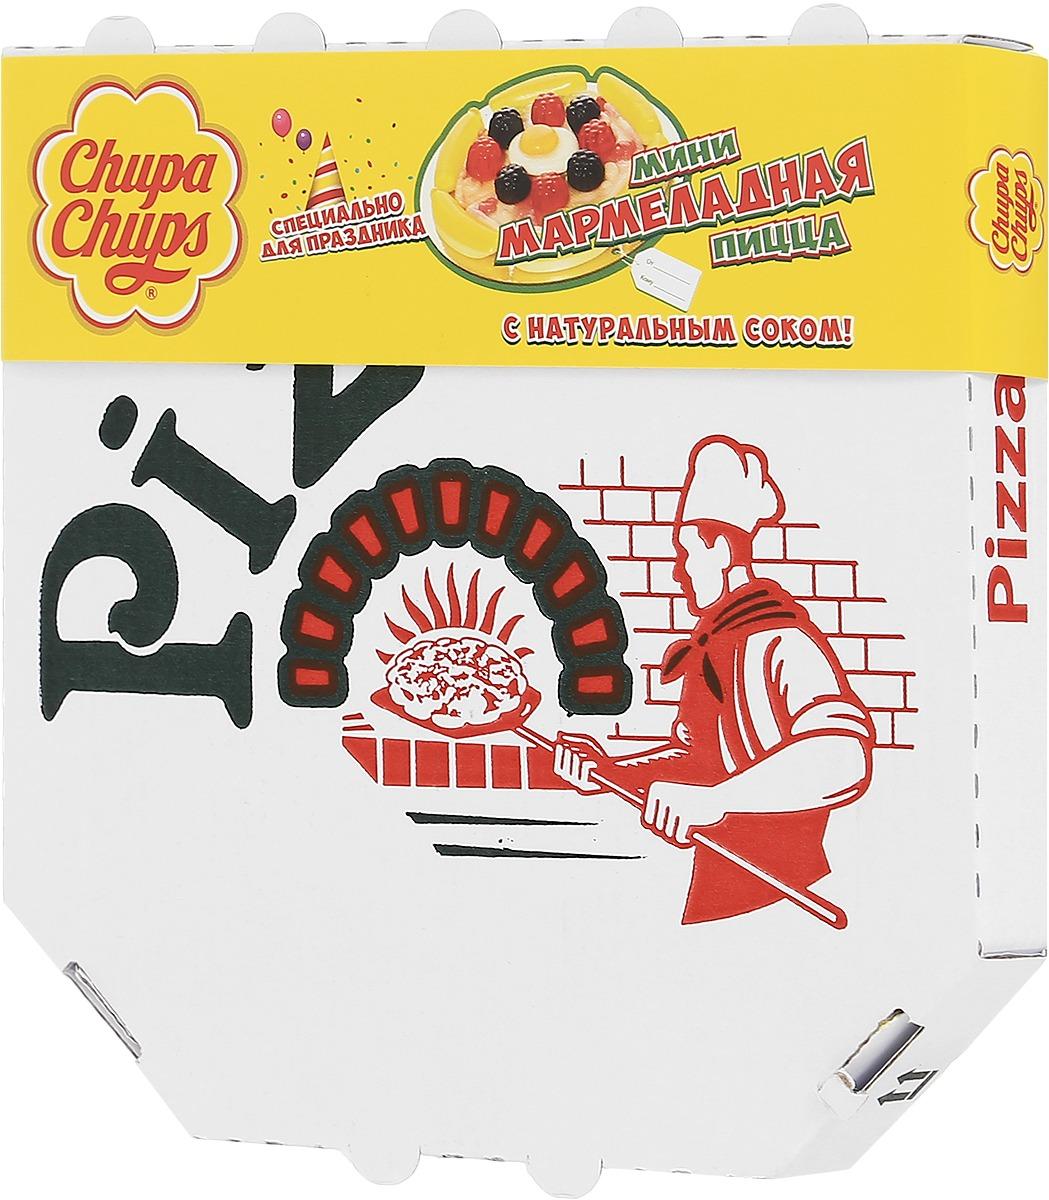 Жевательный мармелад Chupa Chups: Мармеладная пицца.